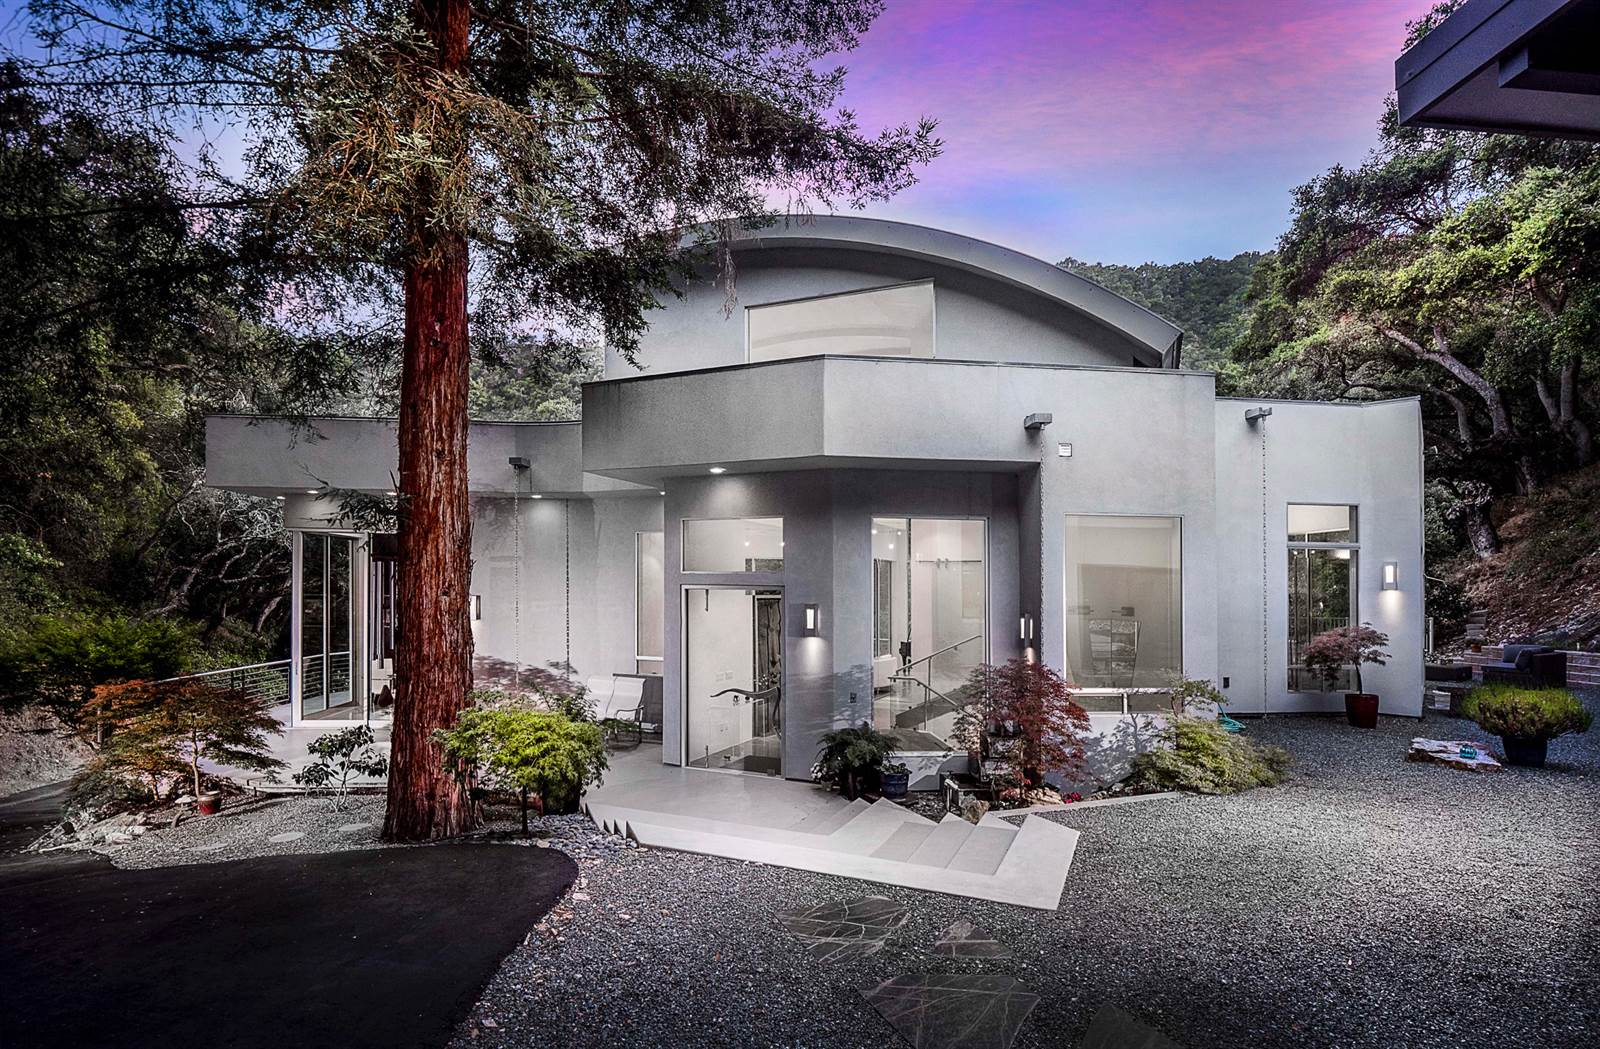 2711 See Canyon Road, San Luis Obispo, CA 93405